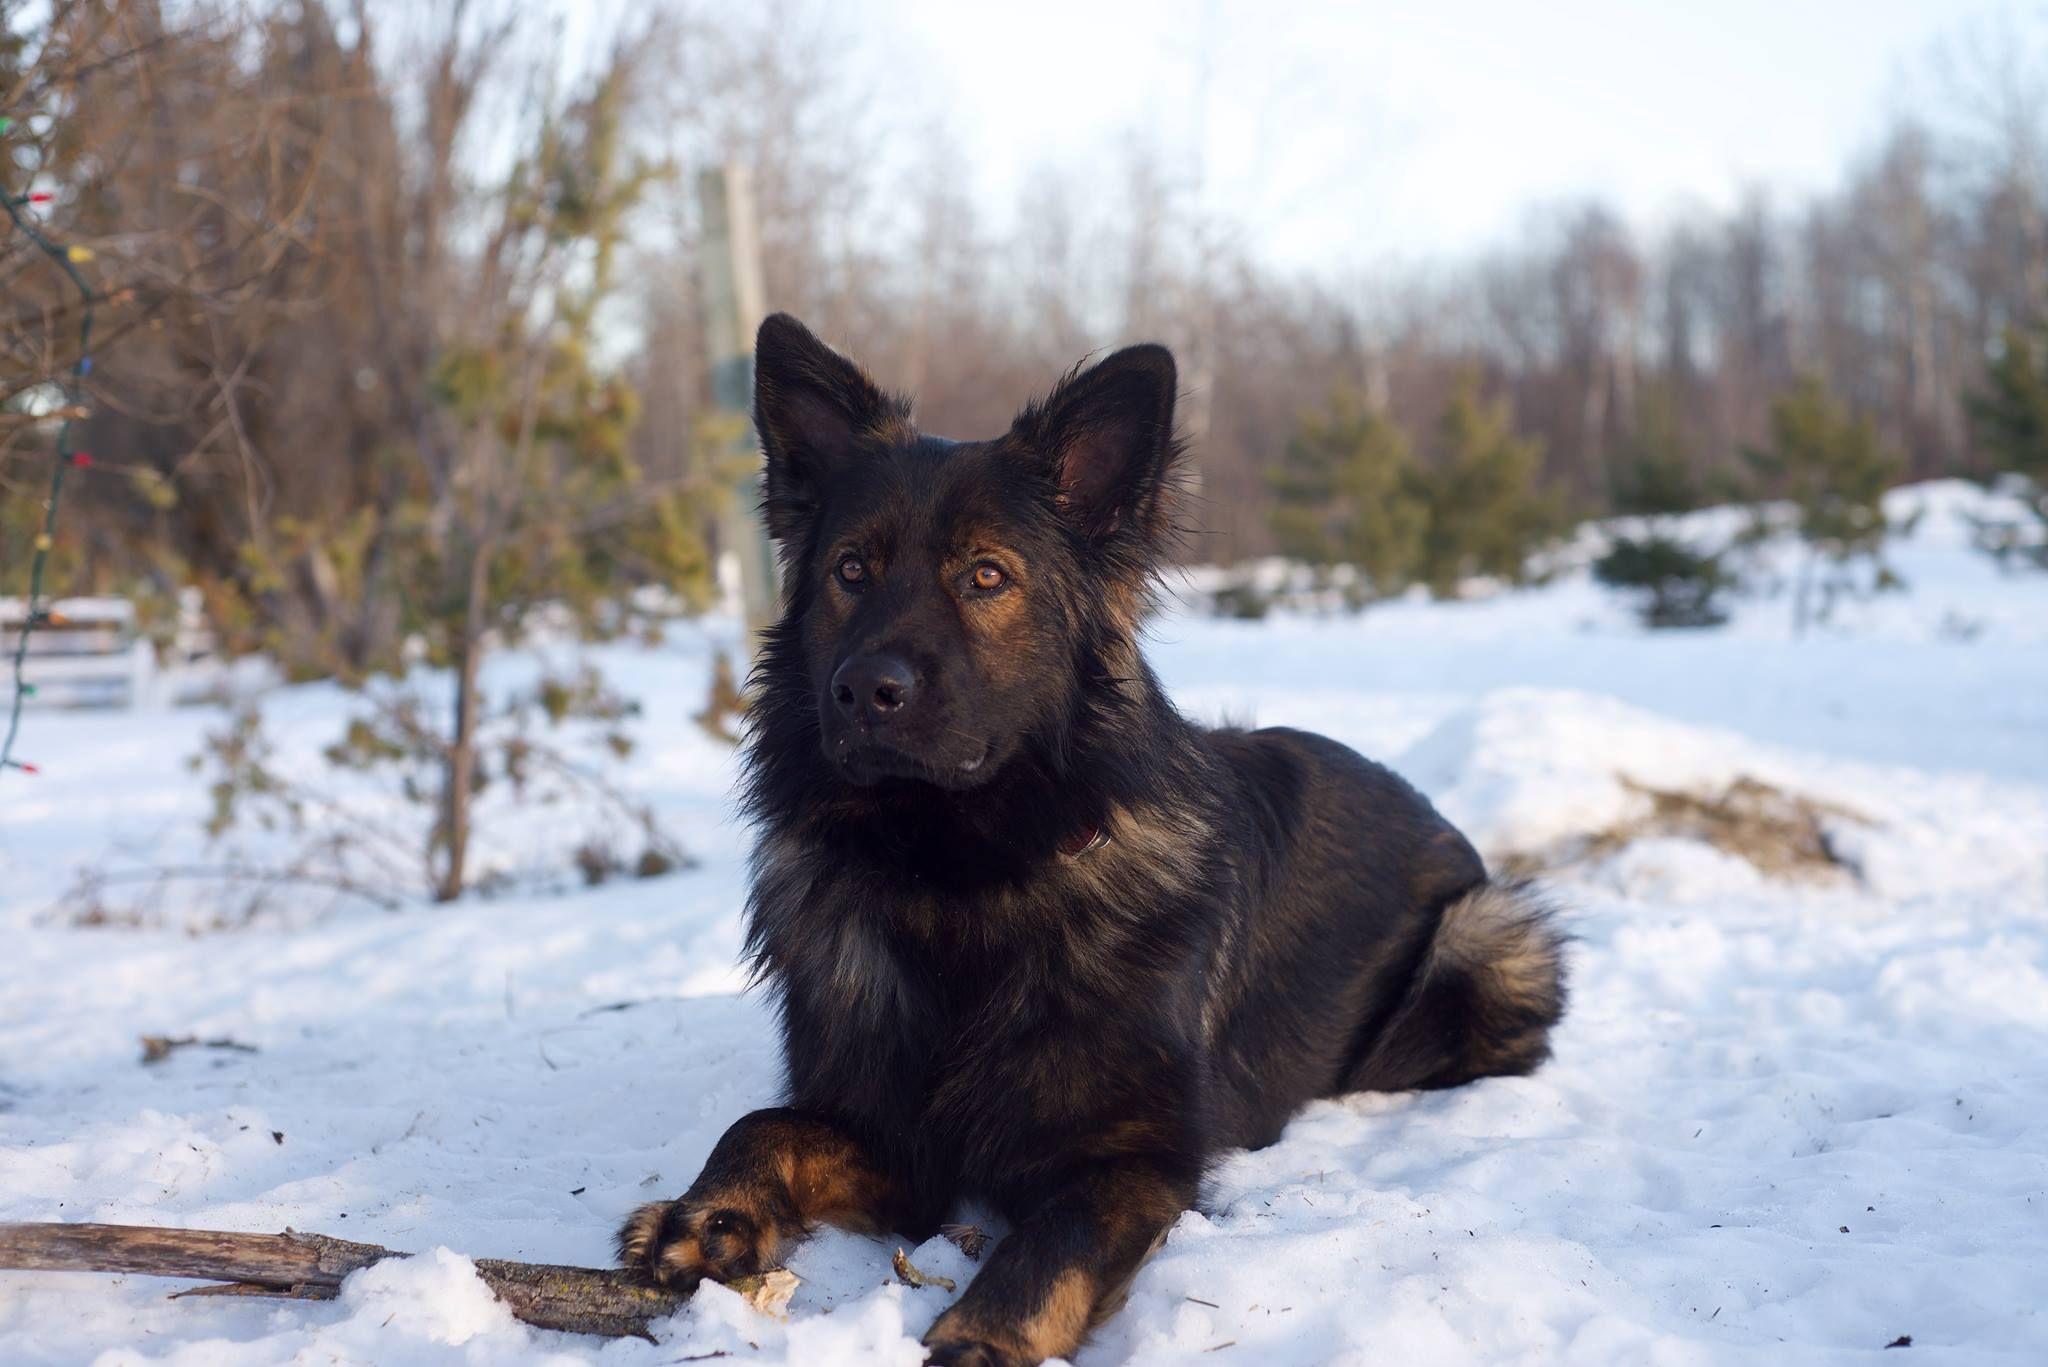 Oakley Our Black Sable Coated Ddr German Shepherd Sable German Shepherd Black Sable German Shepherd Ddr German Shepherd